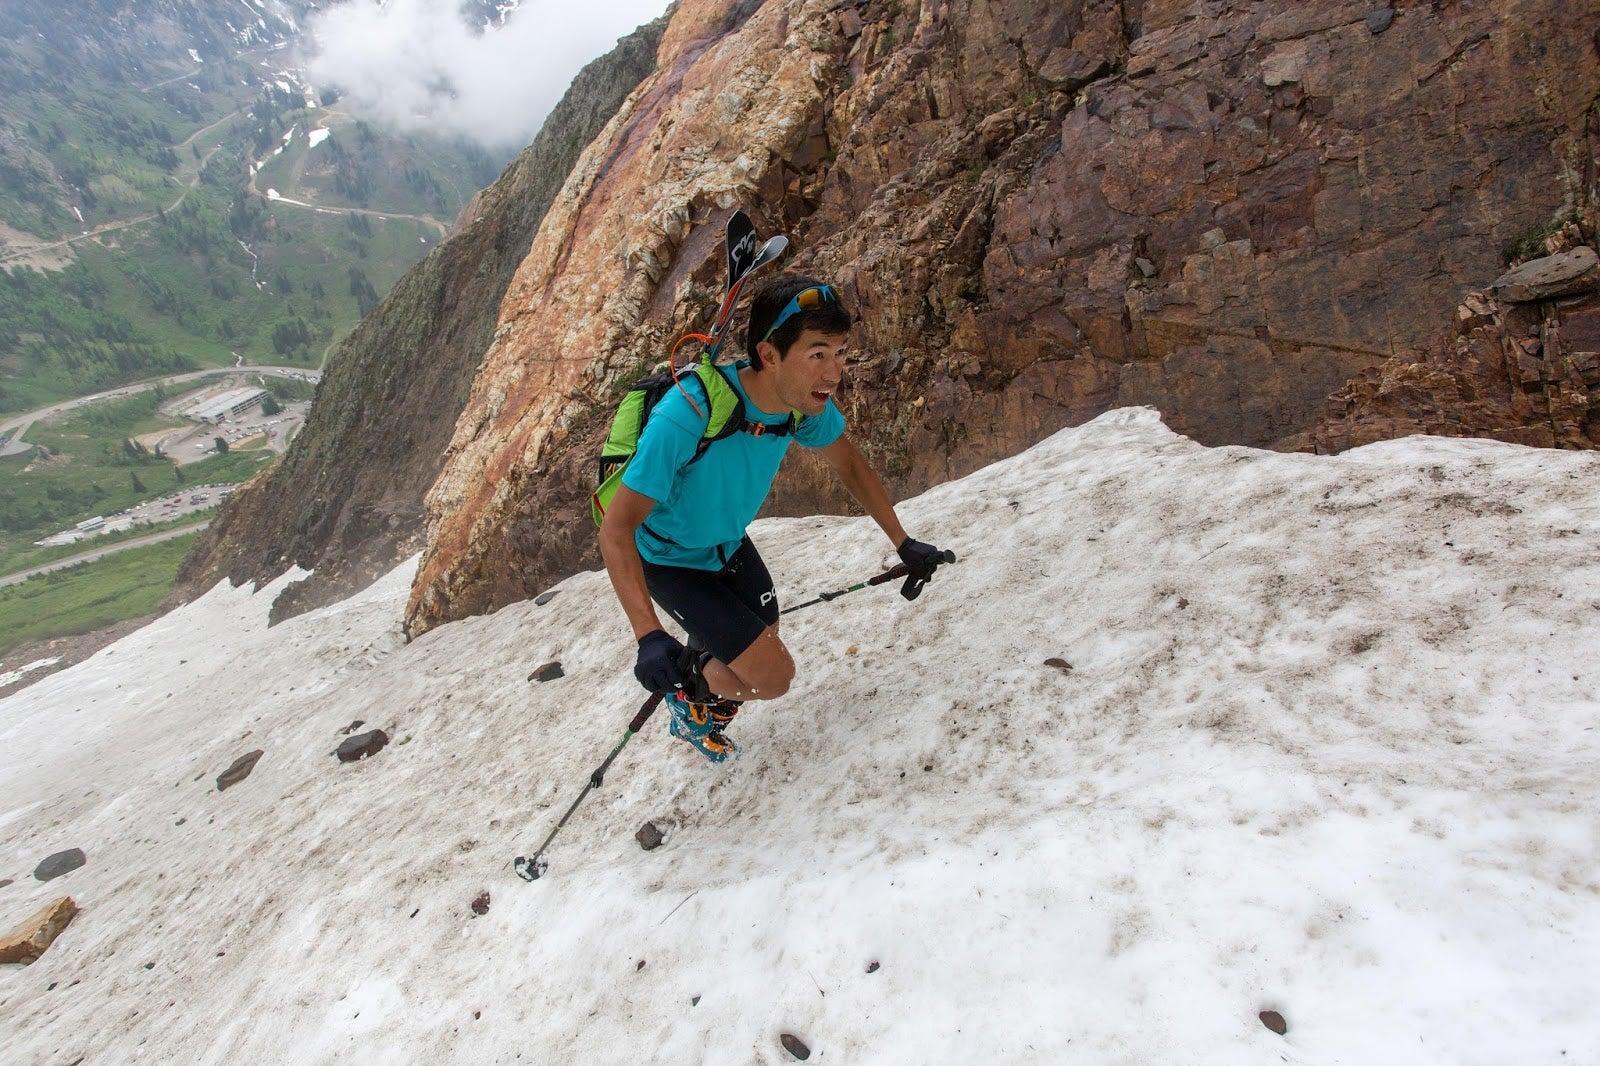 PHOTOS: A Tiny Taste Of Summer Skiing On Mount Superior